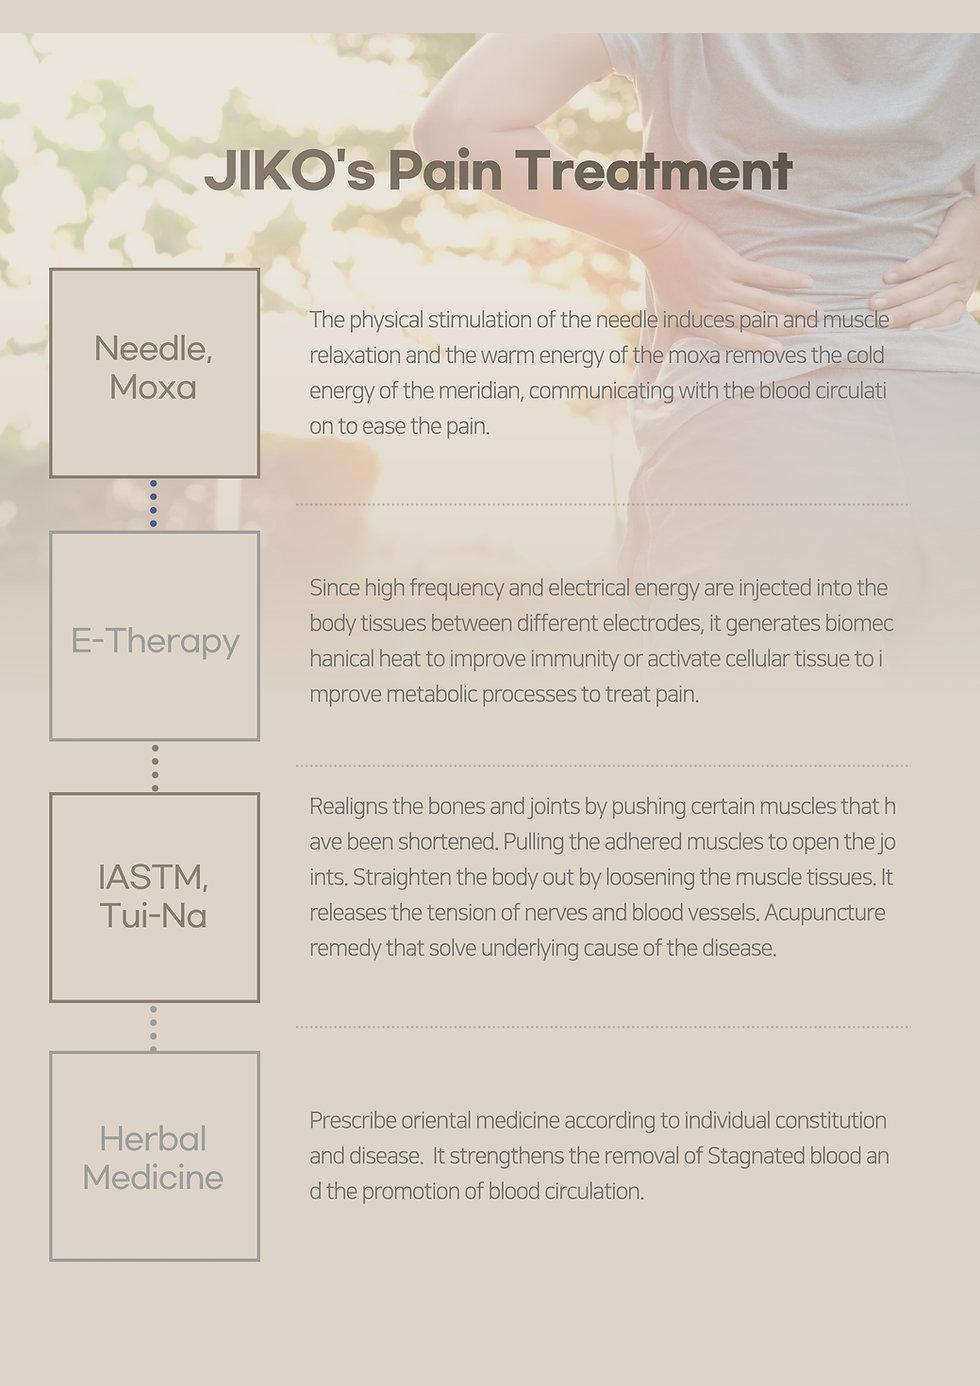 JIKO Pain Treatment Plan Needle, Moxa, E-Therapy, IASTM, Tui-Na, Herbal Medicine